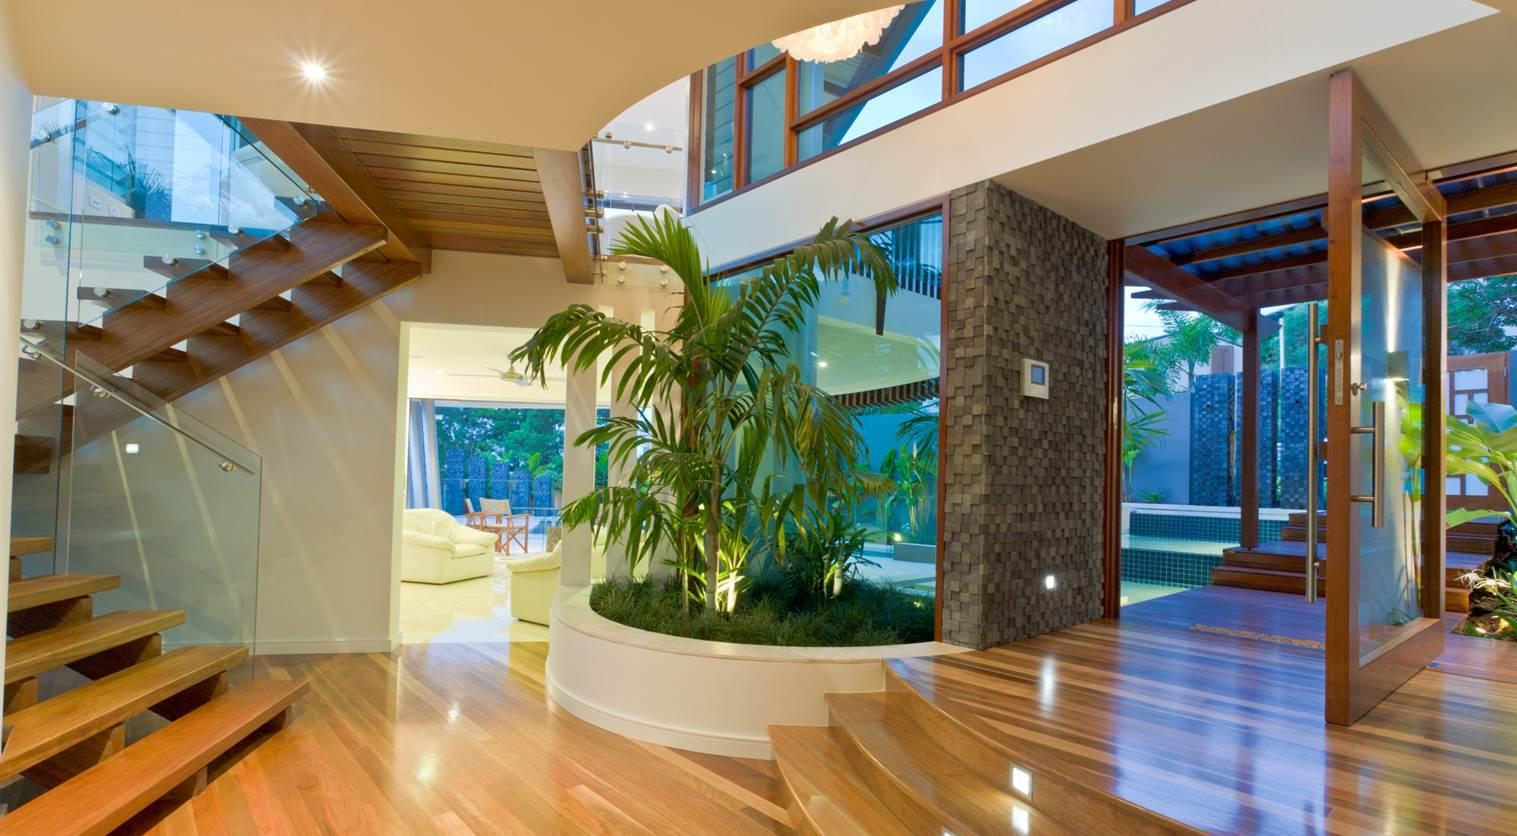 Chris Clout Design: Building Designers Association Queensland: 2011 QUEENSLAND